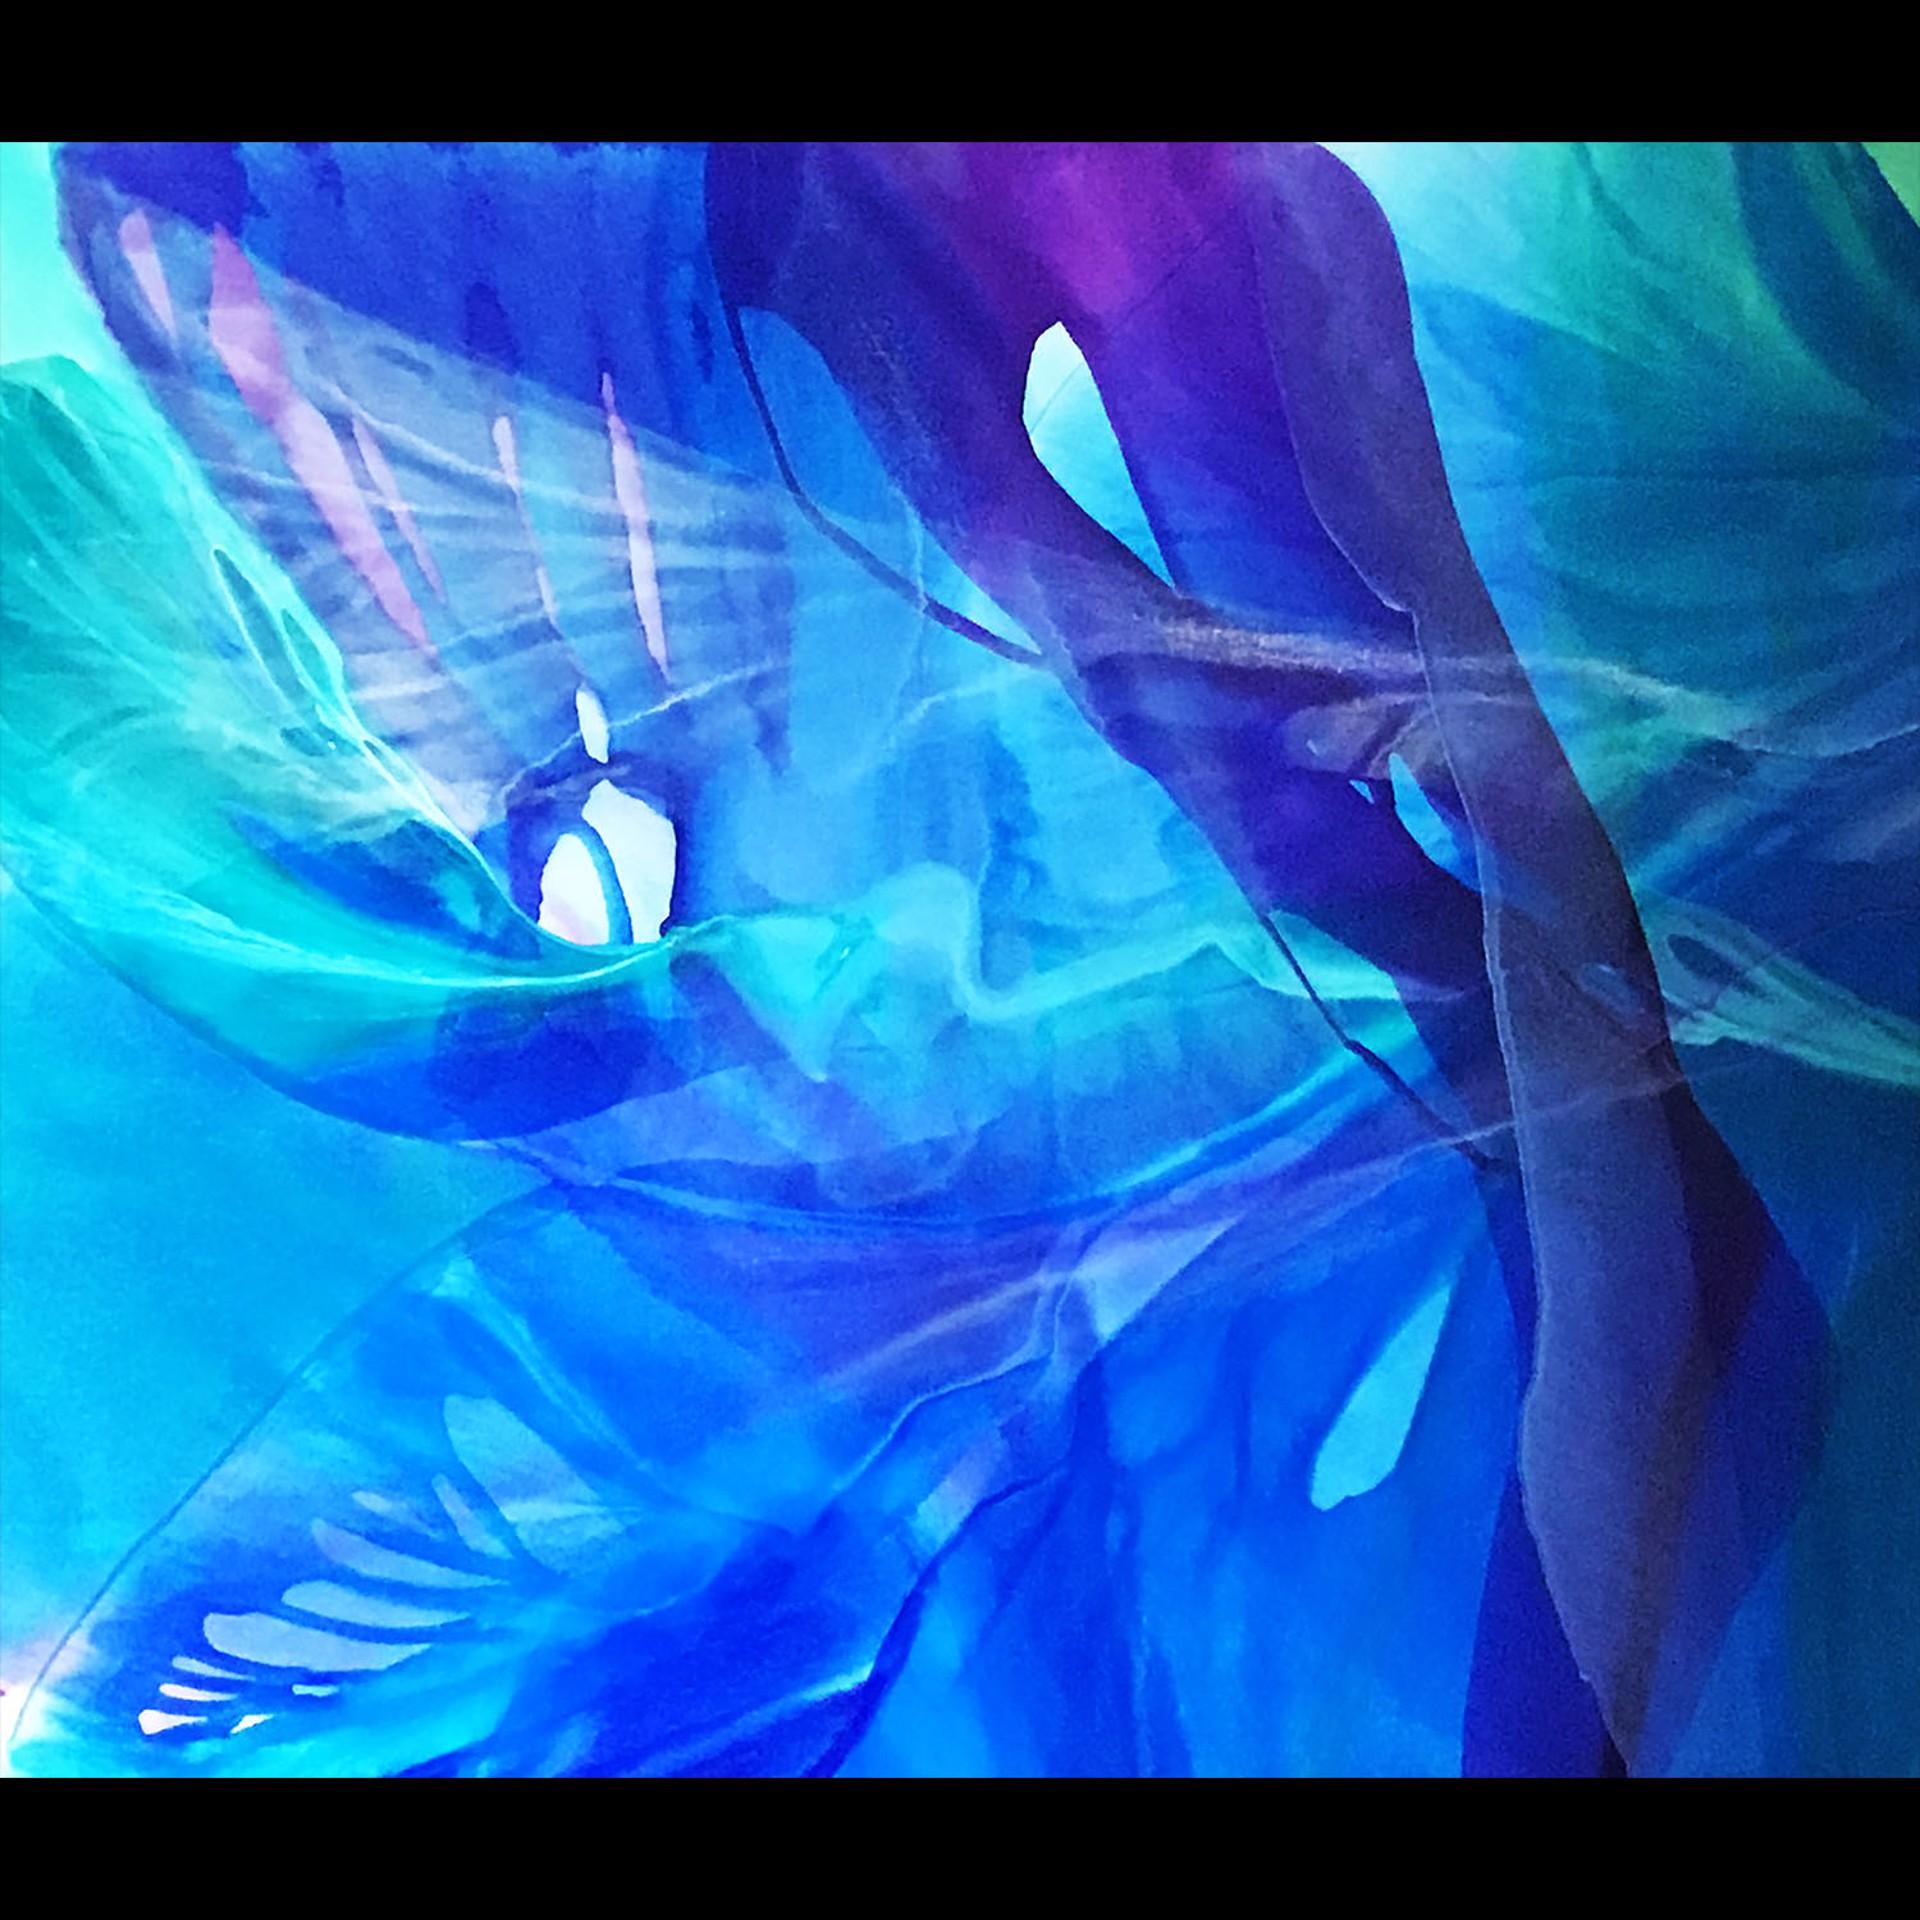 Ocean Butterfly by Jill Amundsen